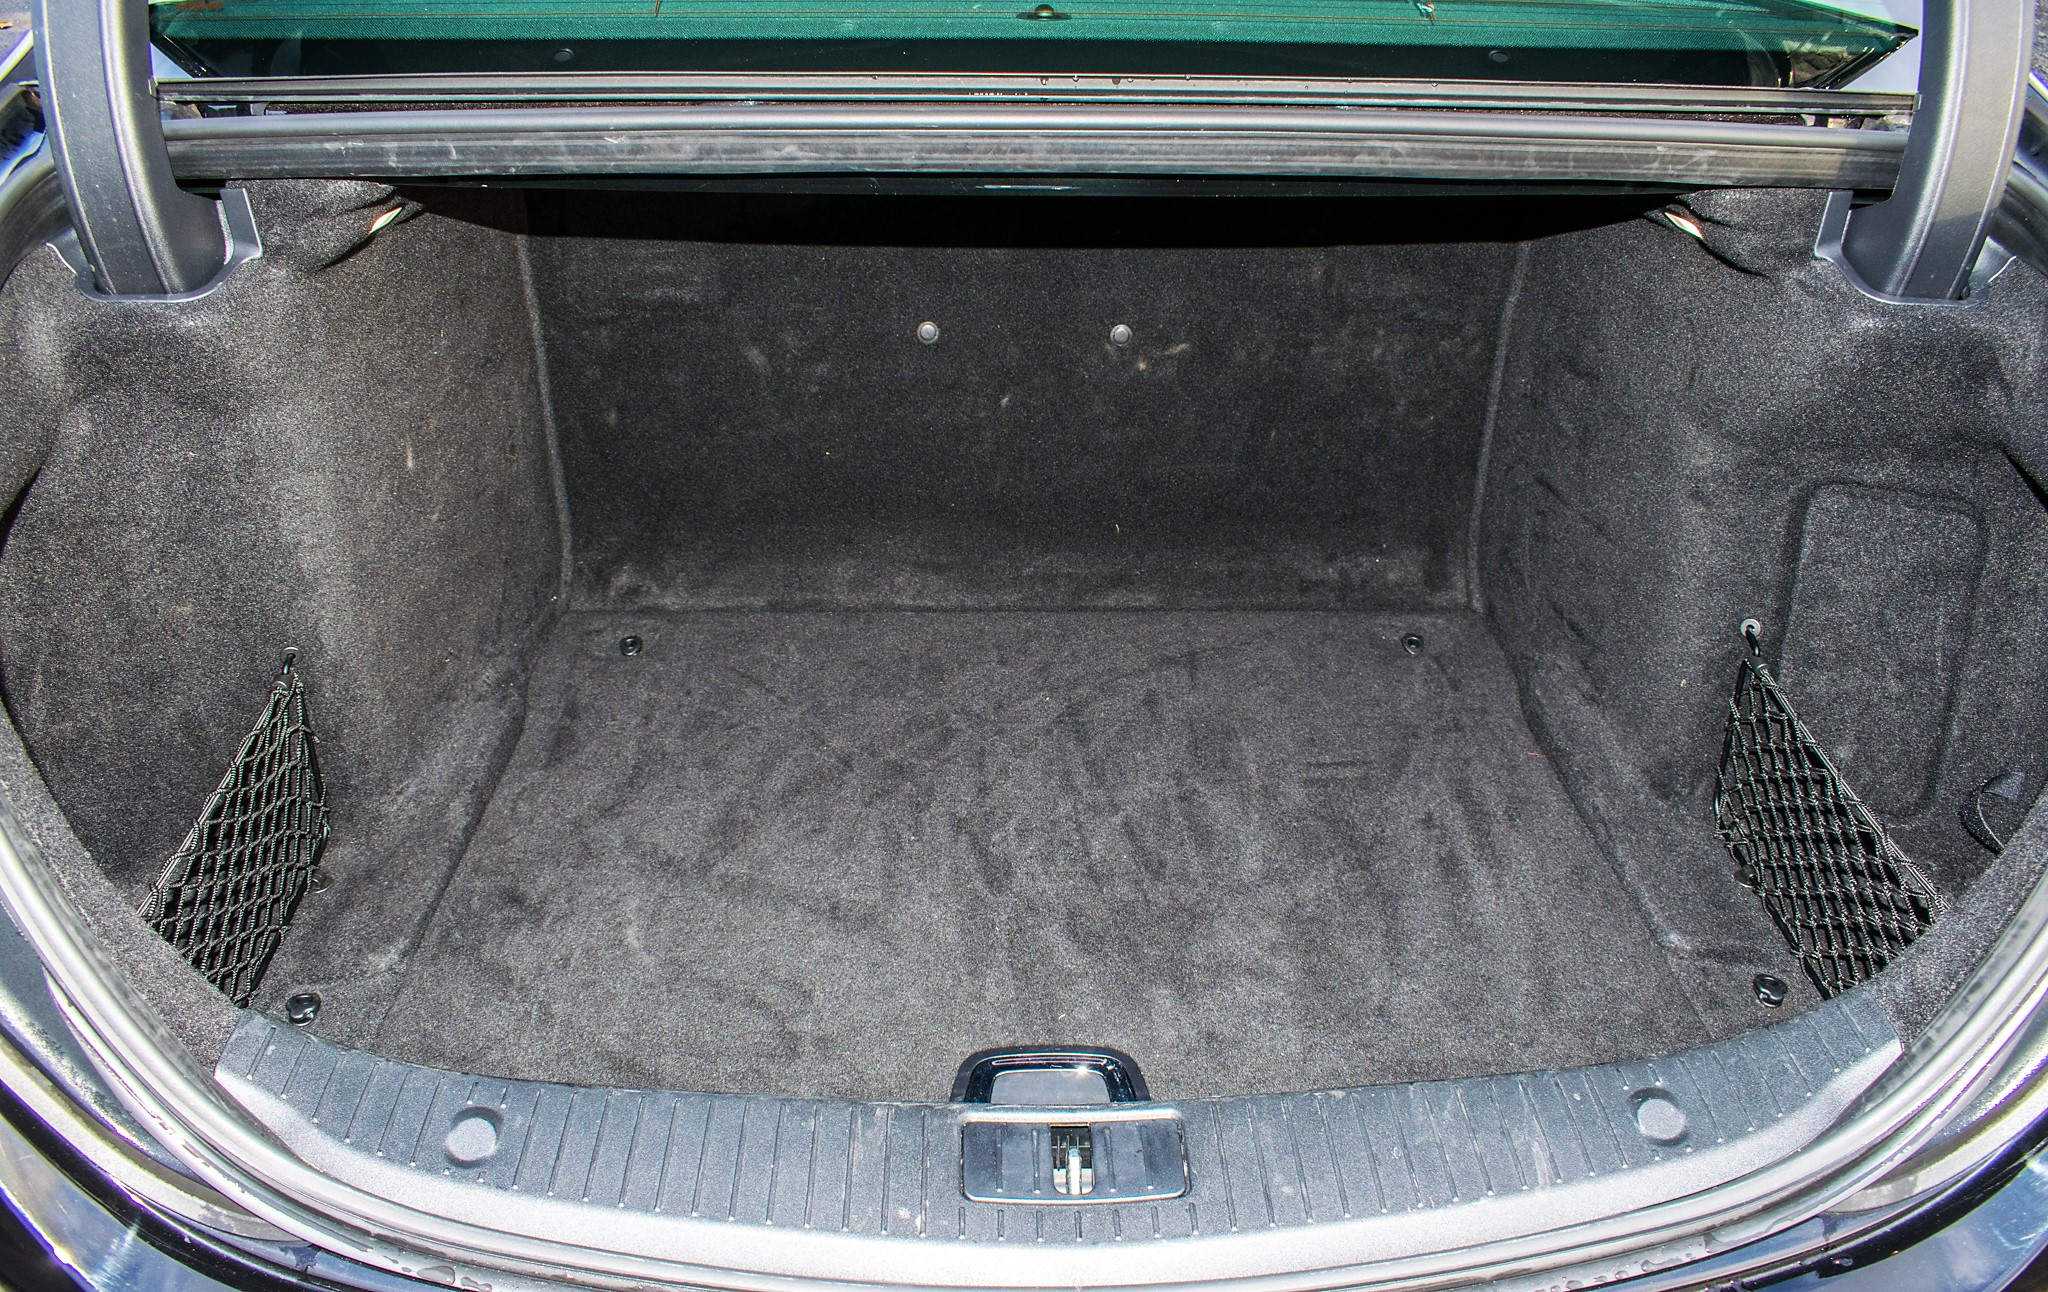 Mercedes Benz S450 L AMG Line Executive auto petrol 4 door saloon car Registration Number: FX68 - Image 19 of 33